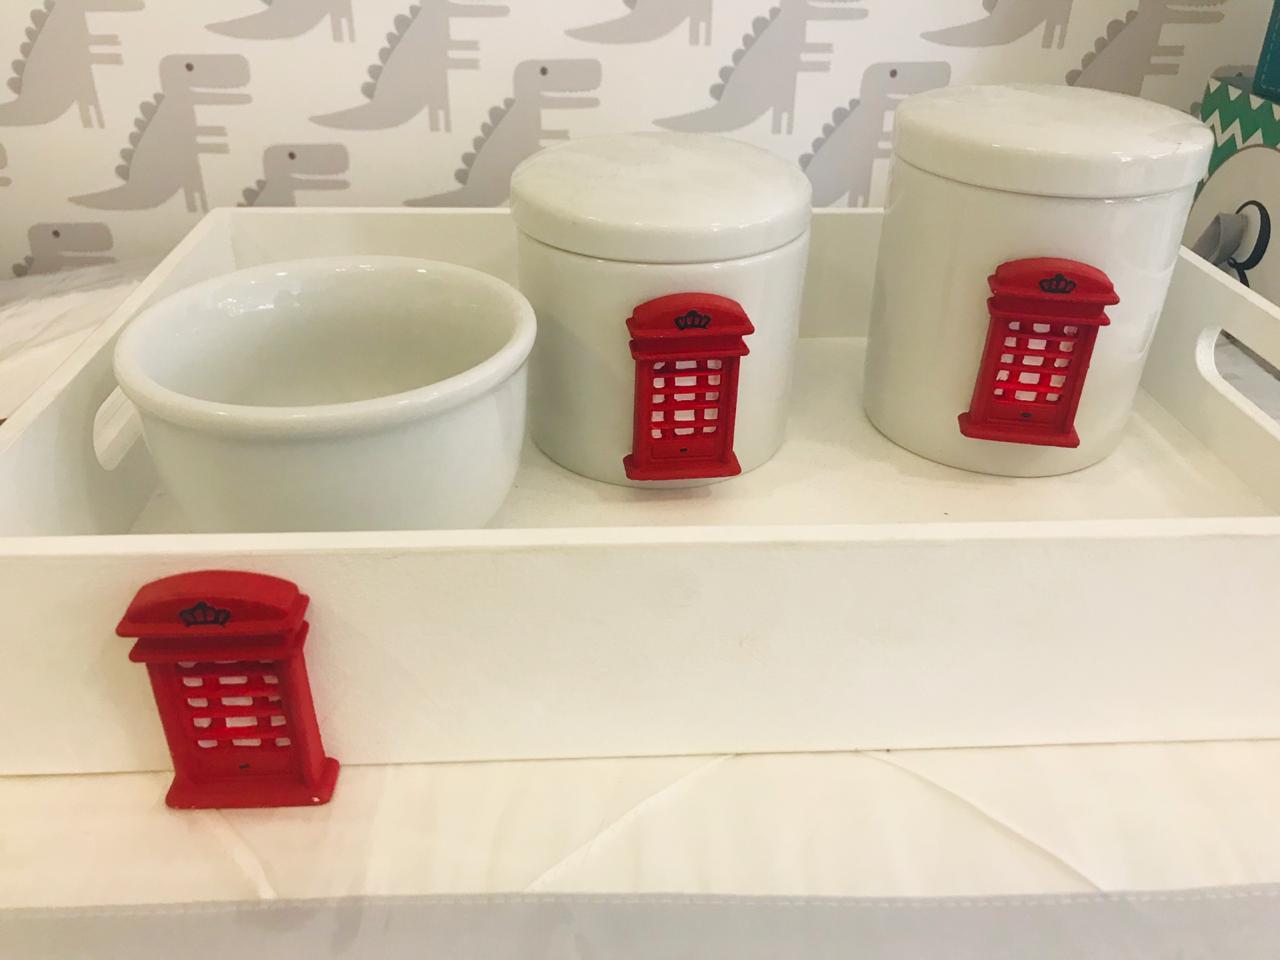 Kit Porcelana 2 Potes, 1 Molhadeira e 1 Bandeja Londres - Divino Talento